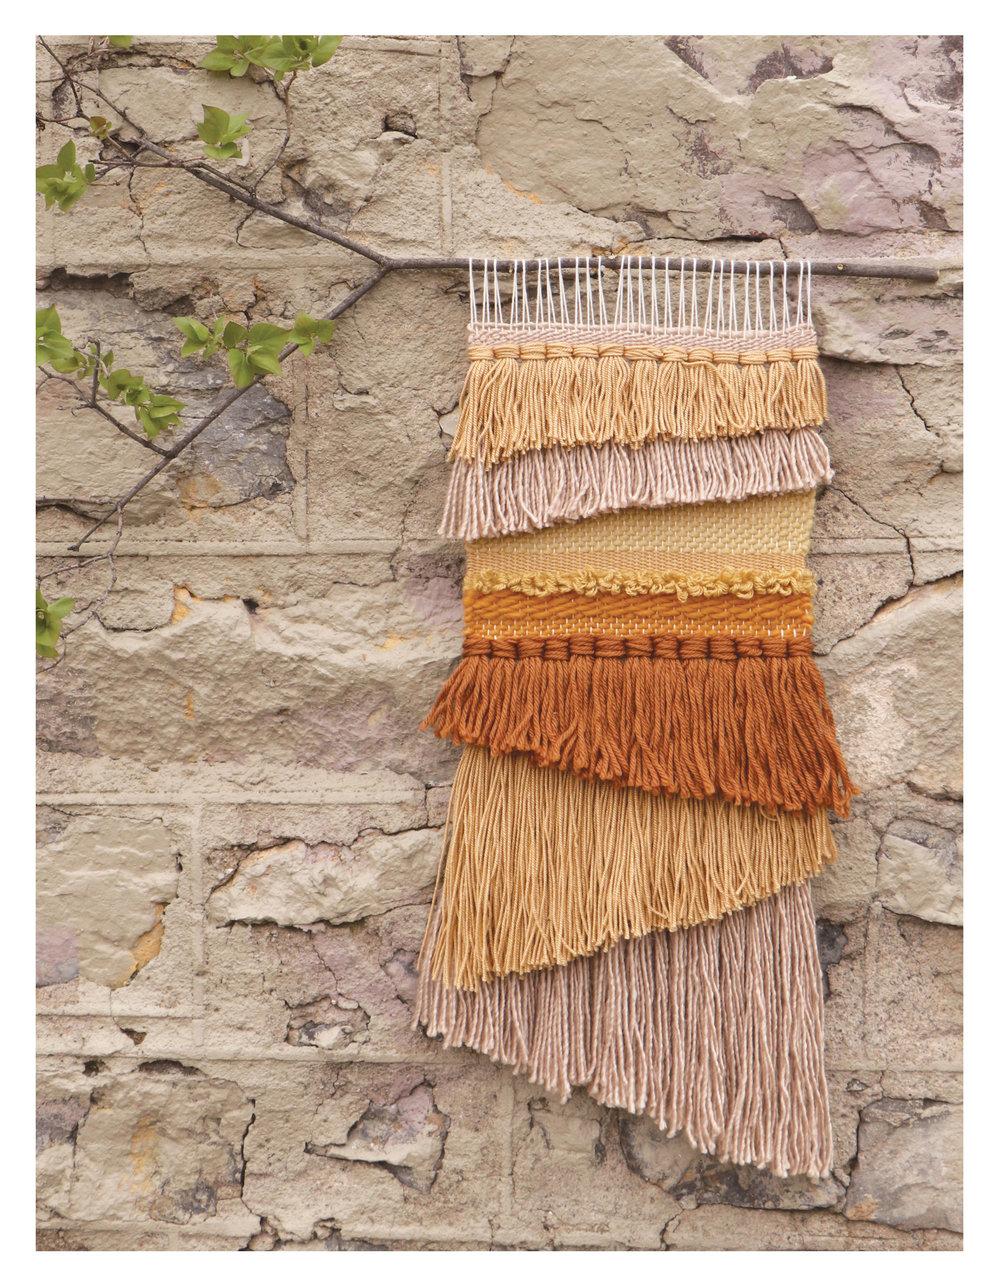 weaving-11.jpg